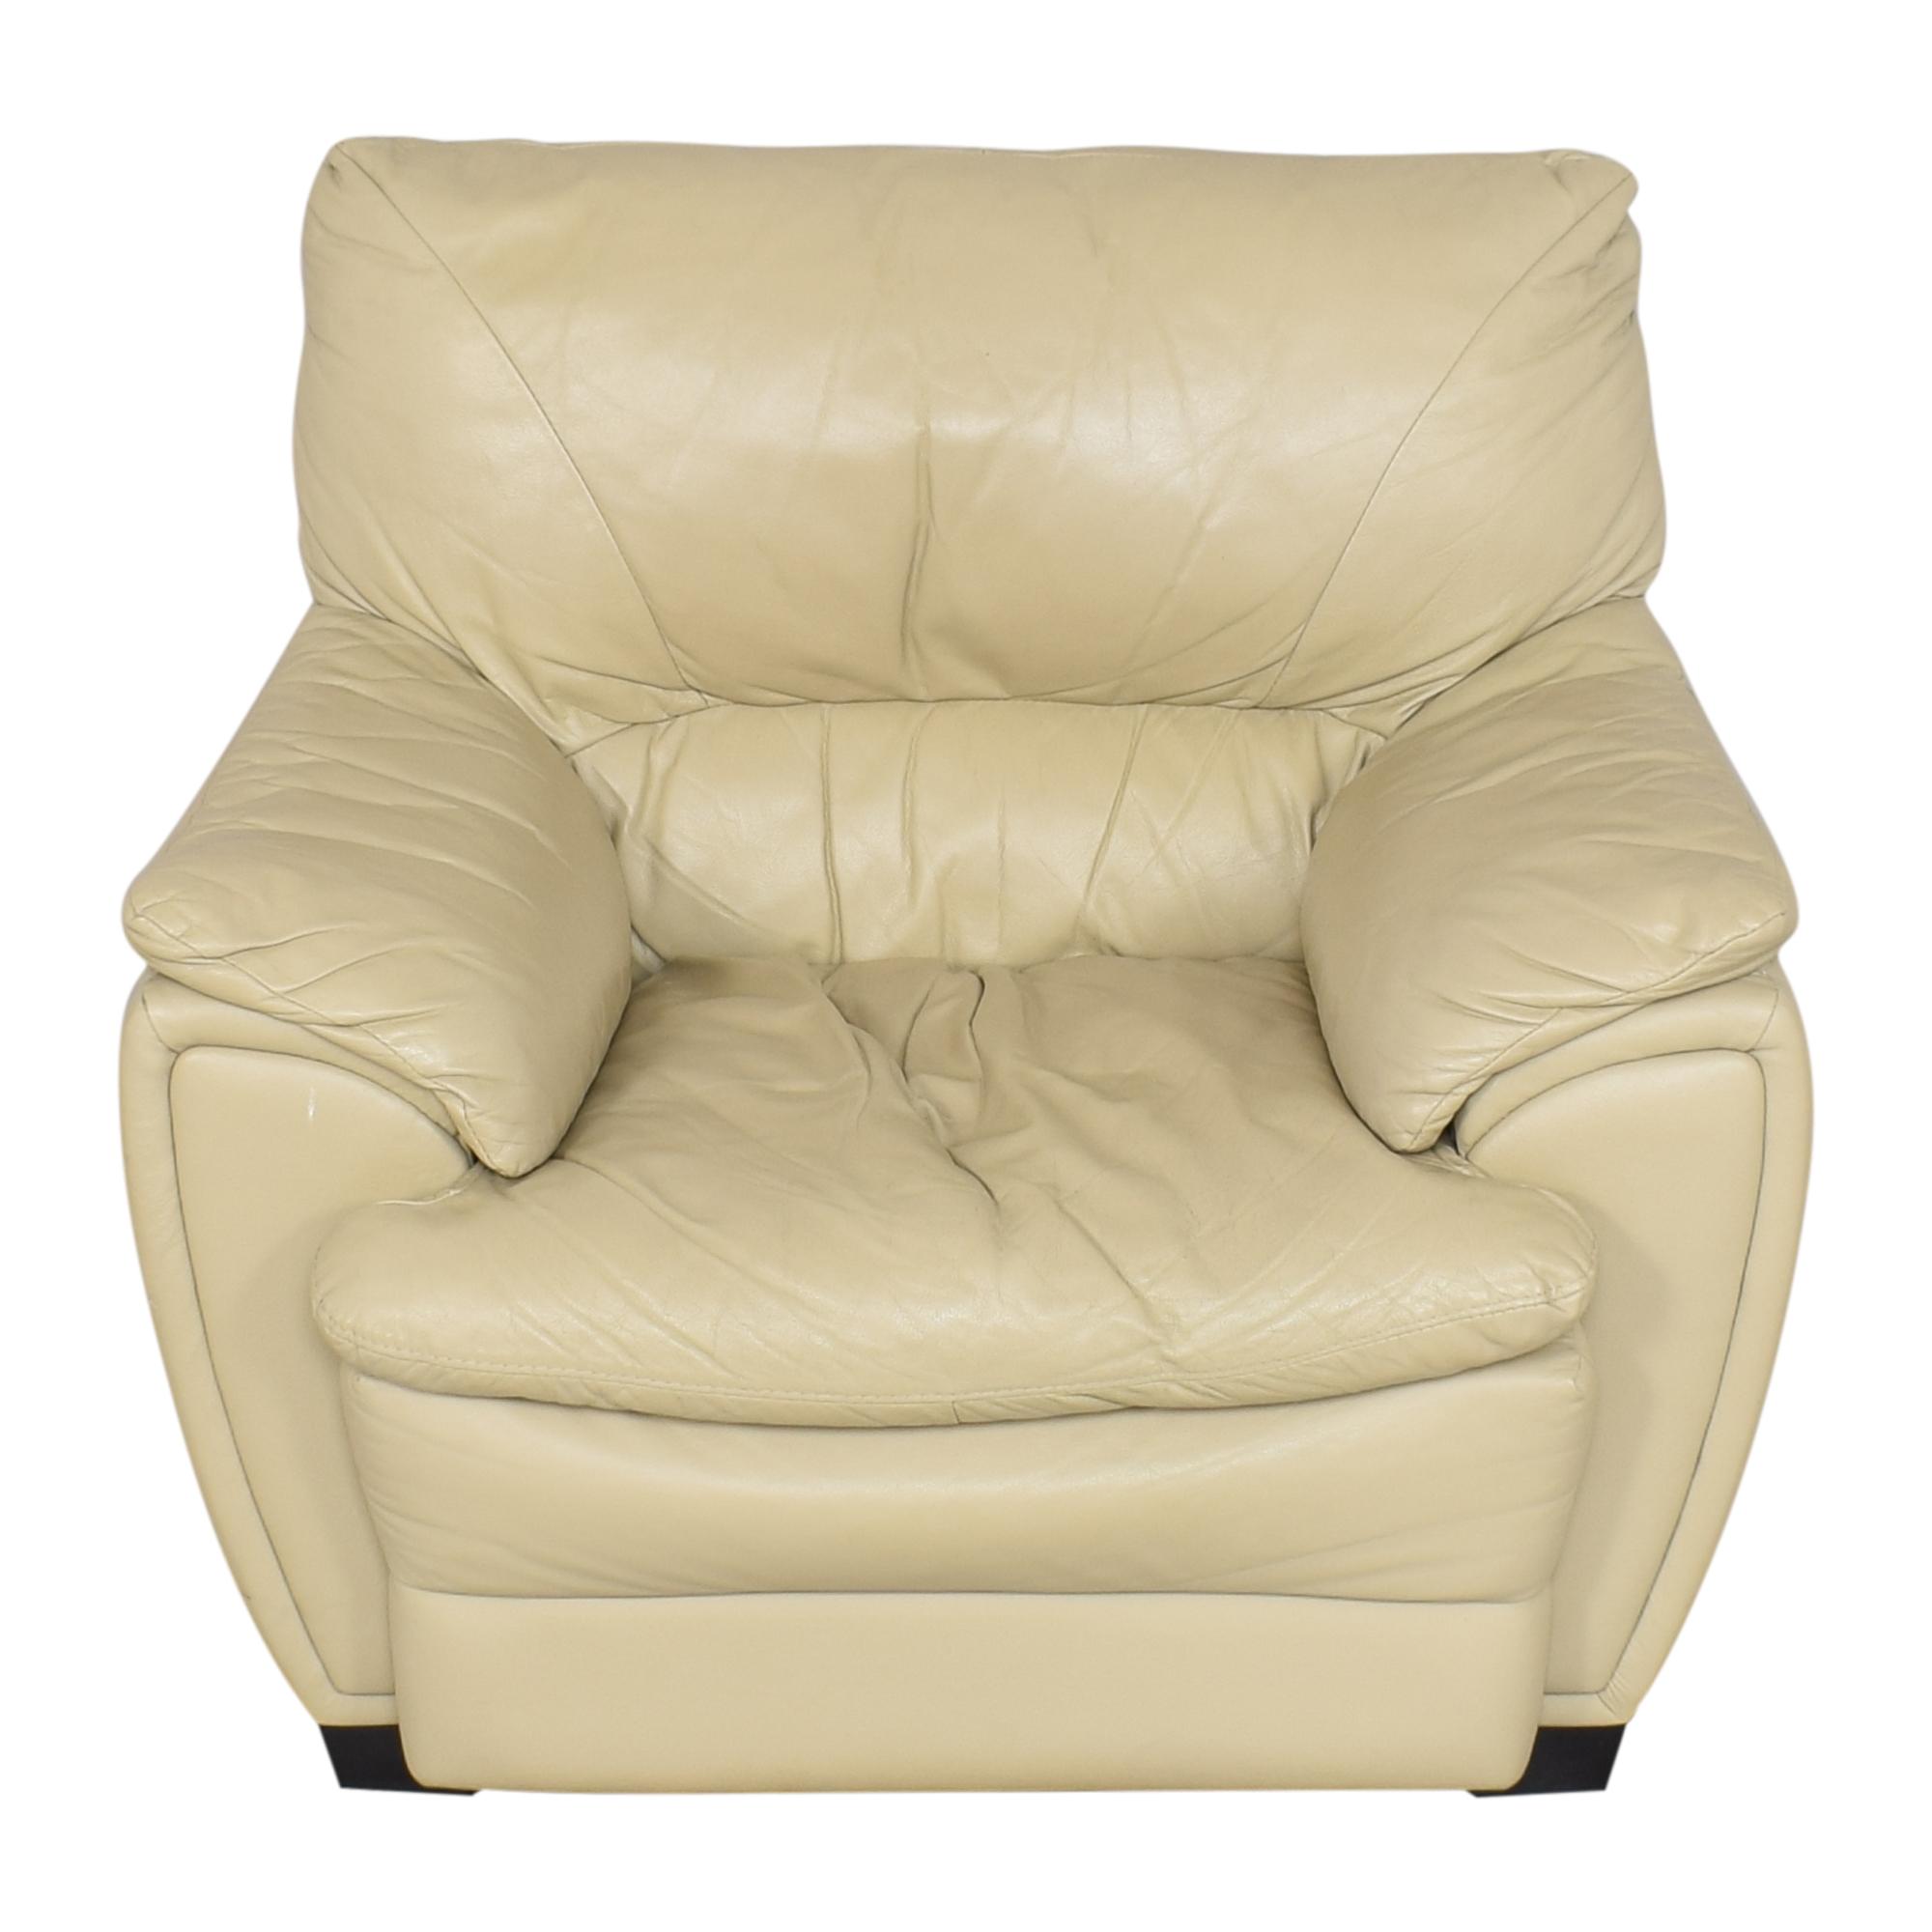 Raymour & Flanigan Raymour & Flanigan Padded Arm Chair ma